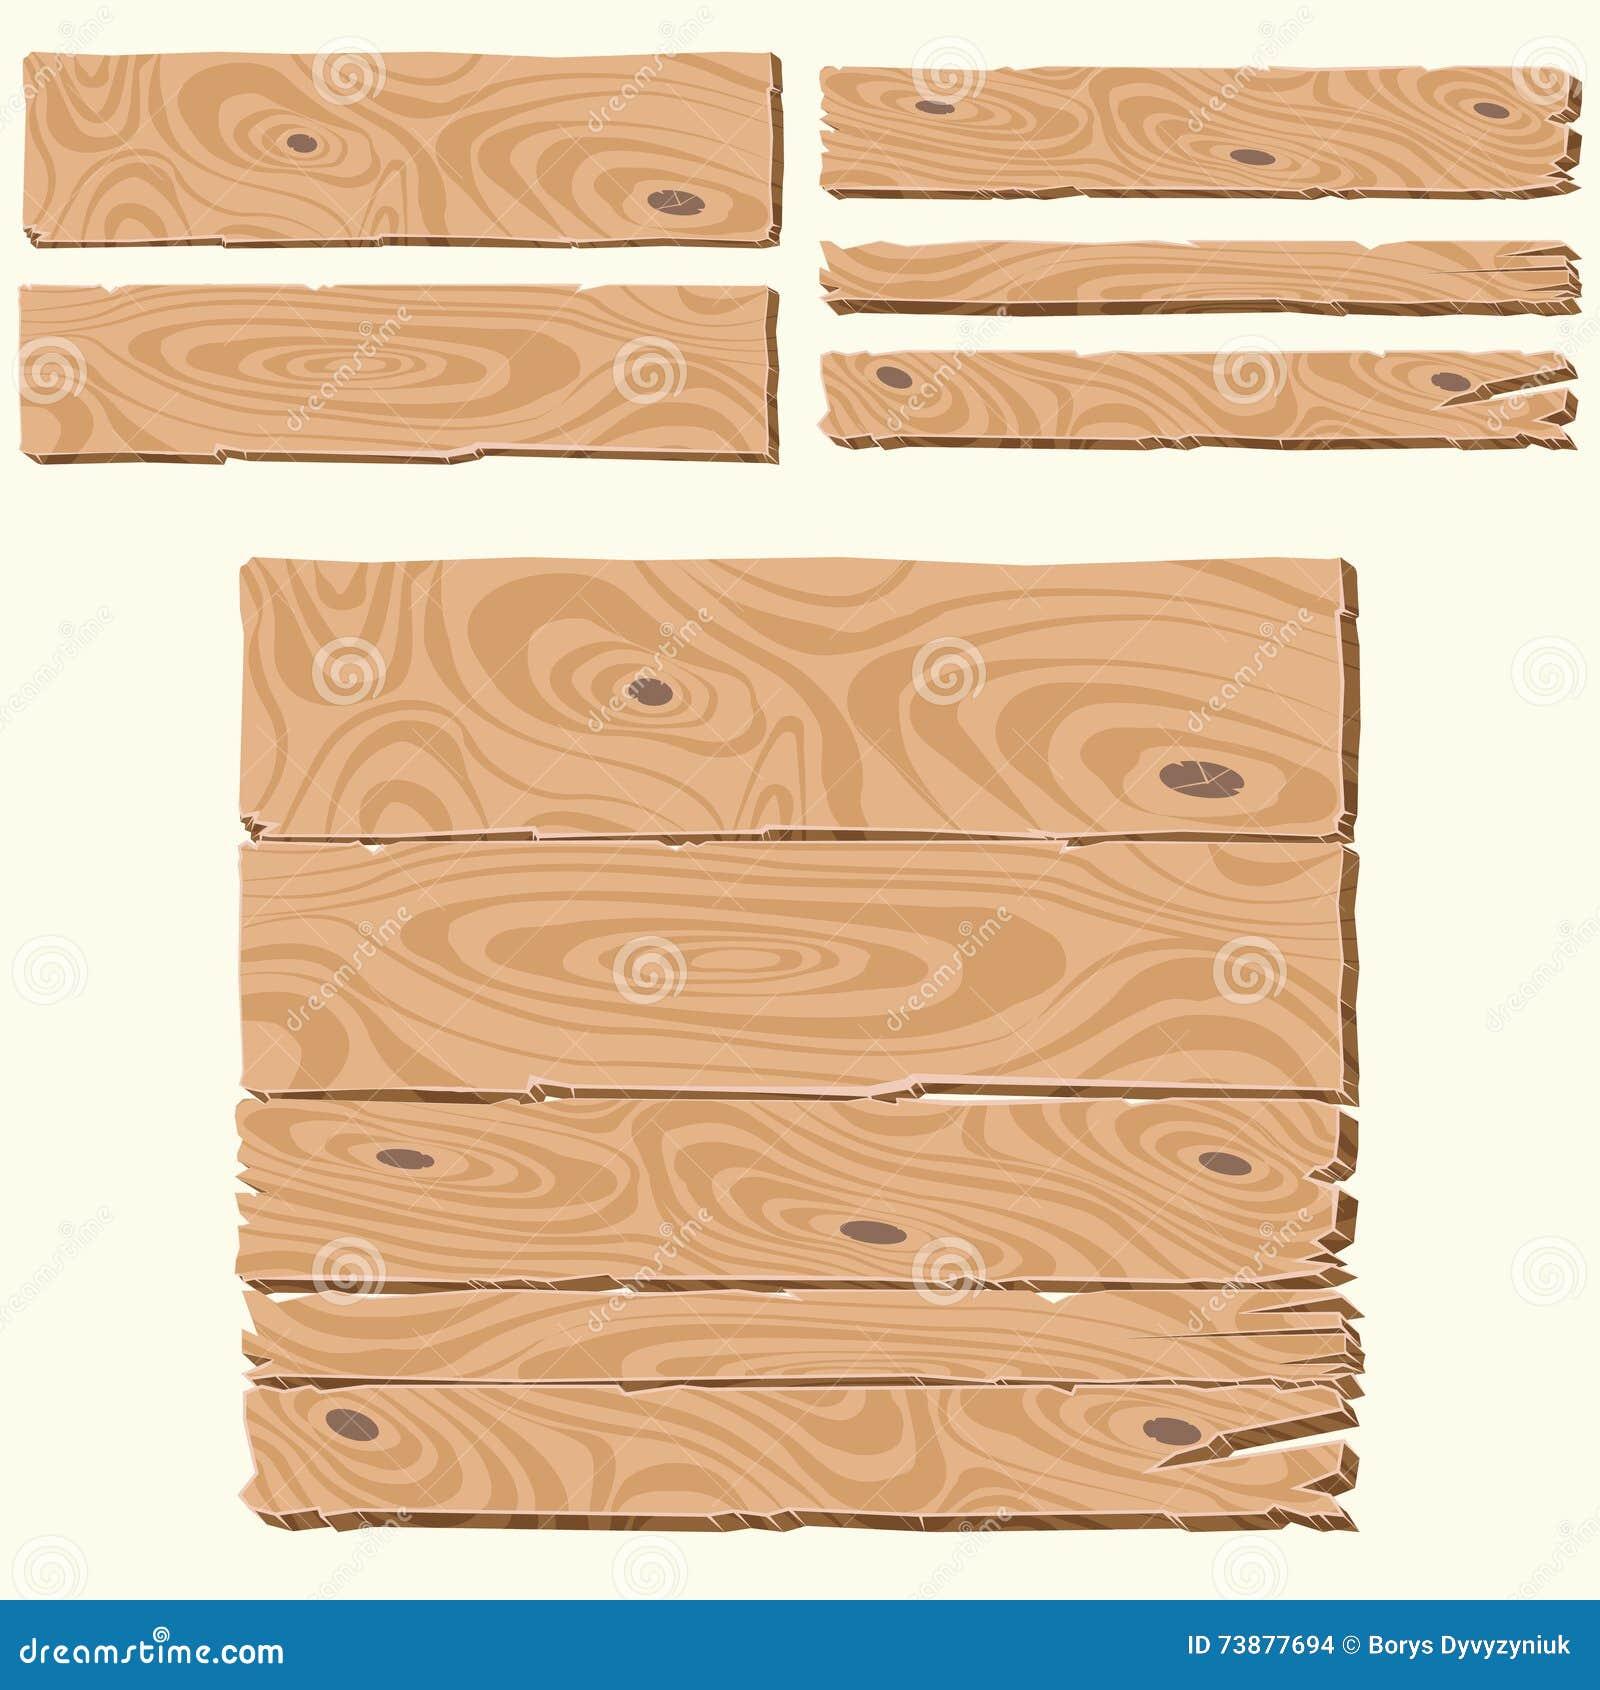 Wooden Plank Cartoon : Set of wooden planks cartoon style, blank wooden boards, wooden banner ...